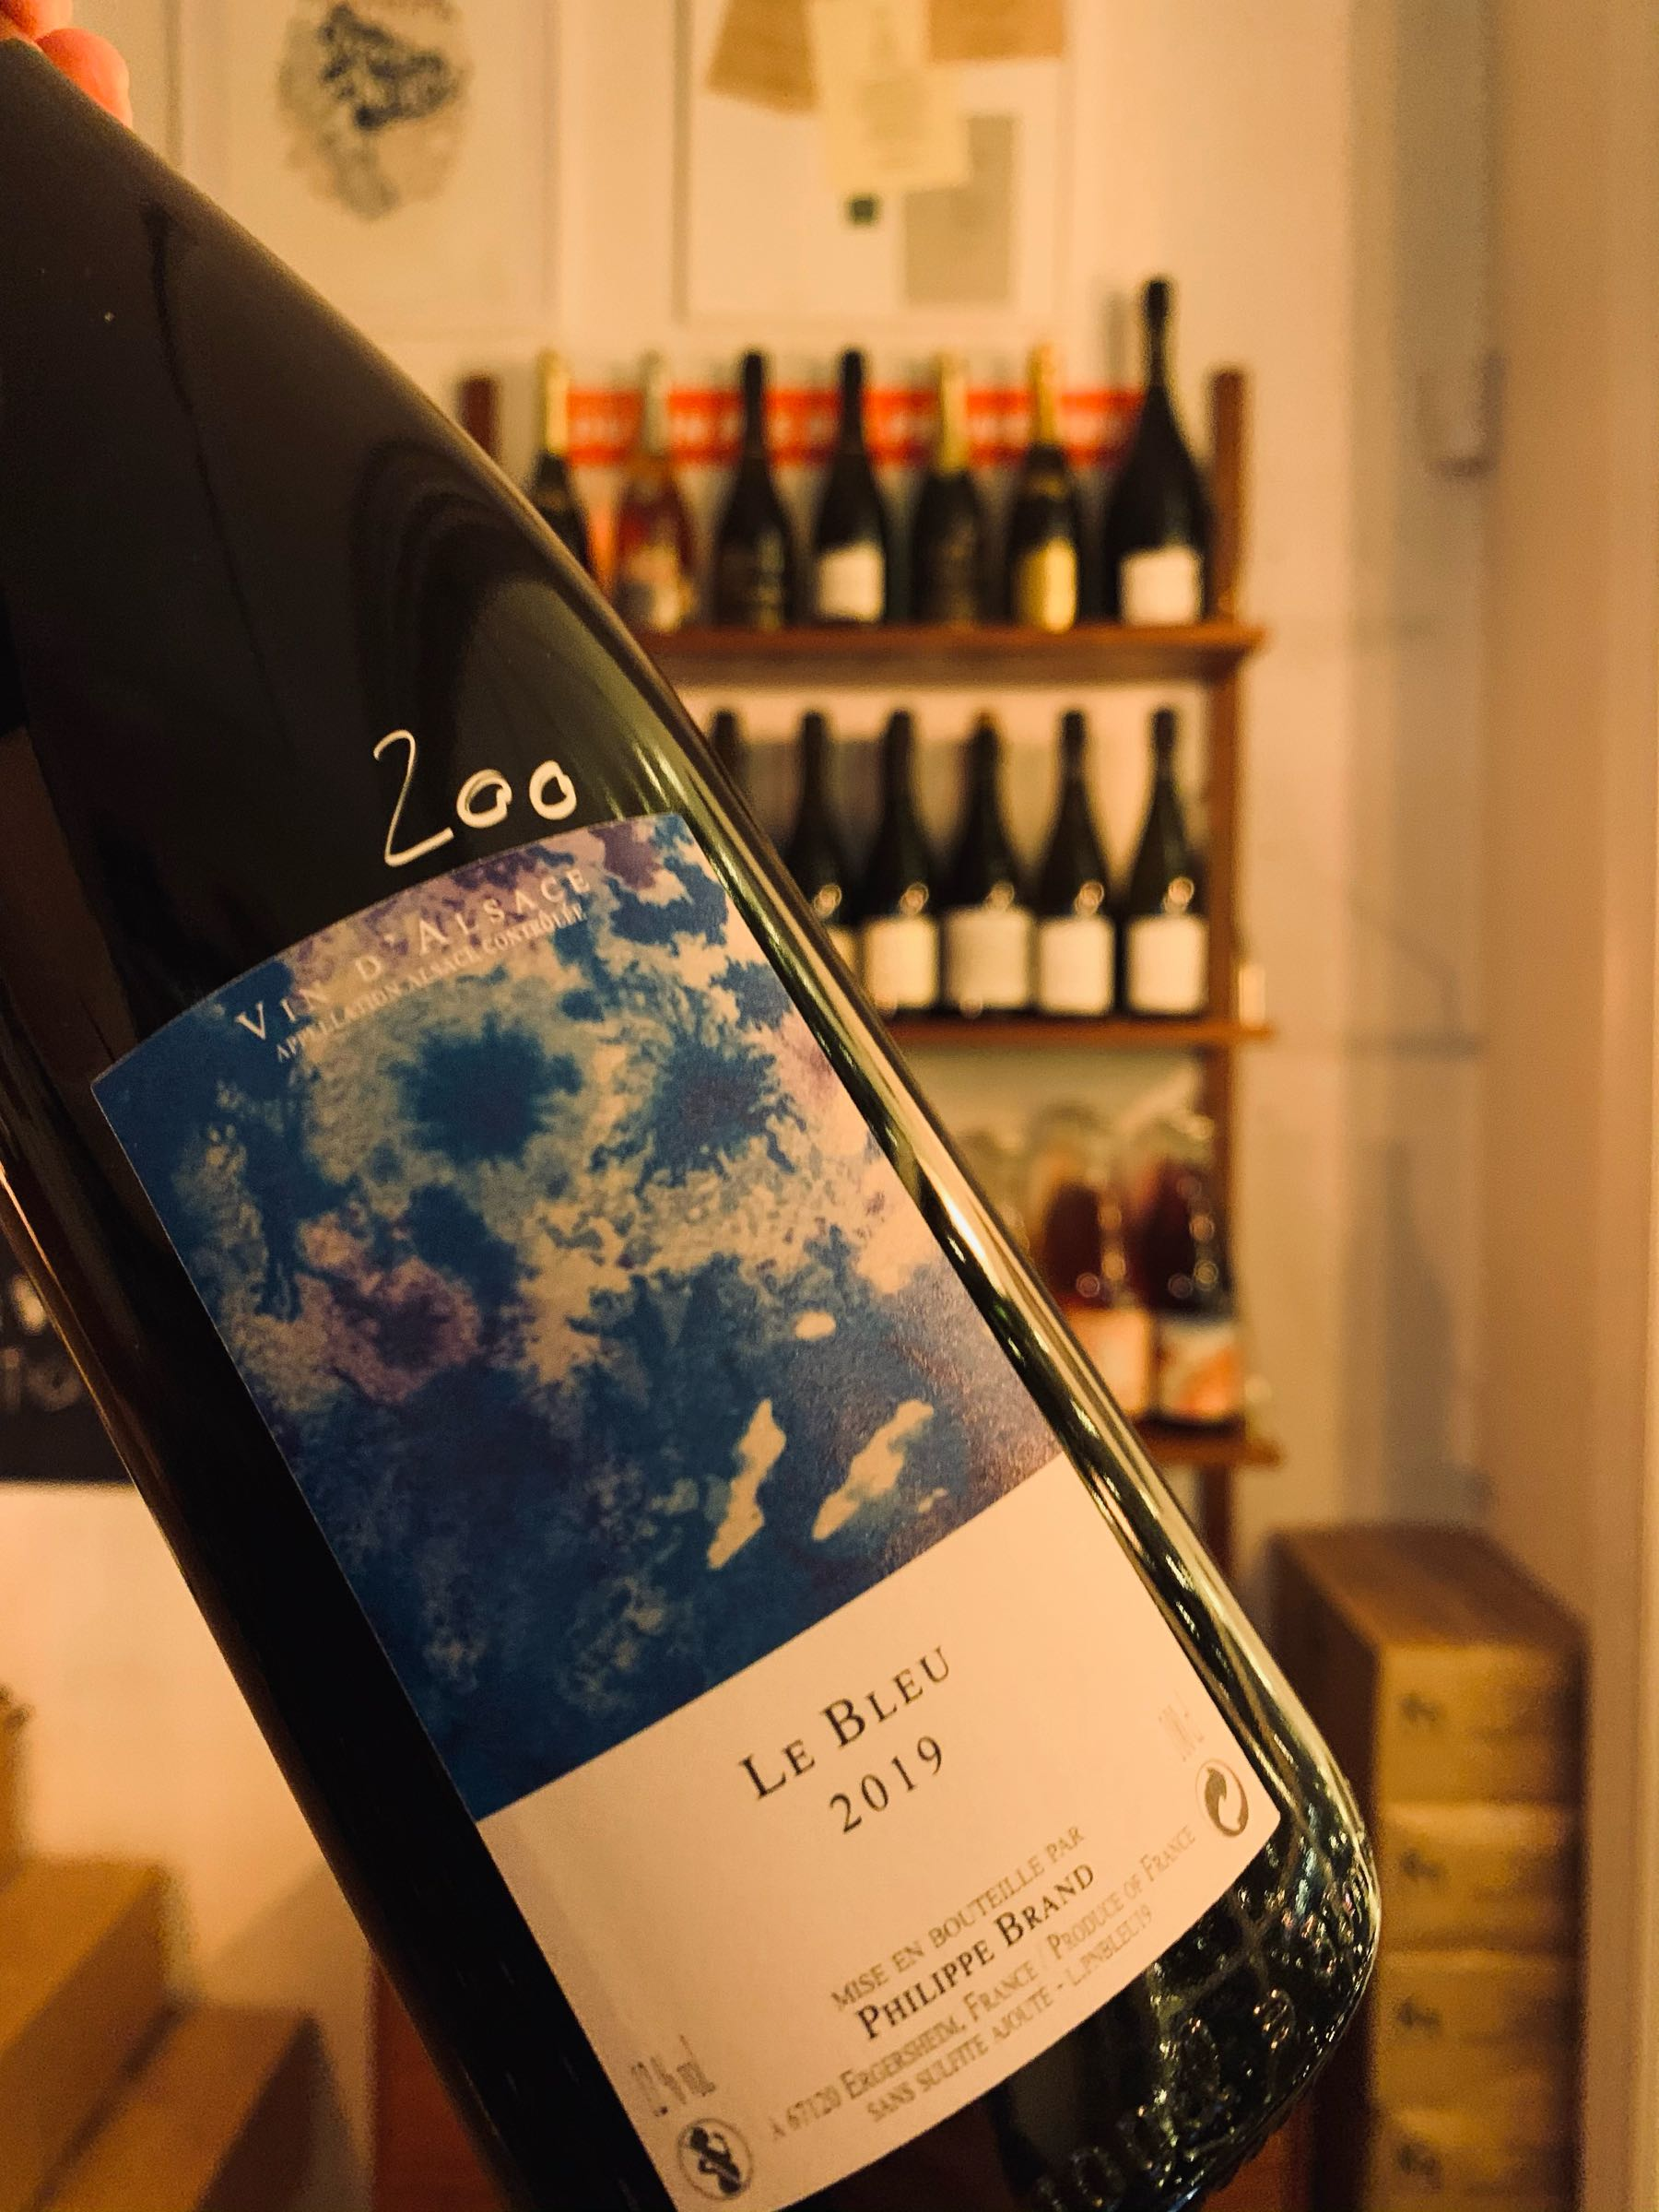 Le Bleu Pinot 2018 - Domaine Brand